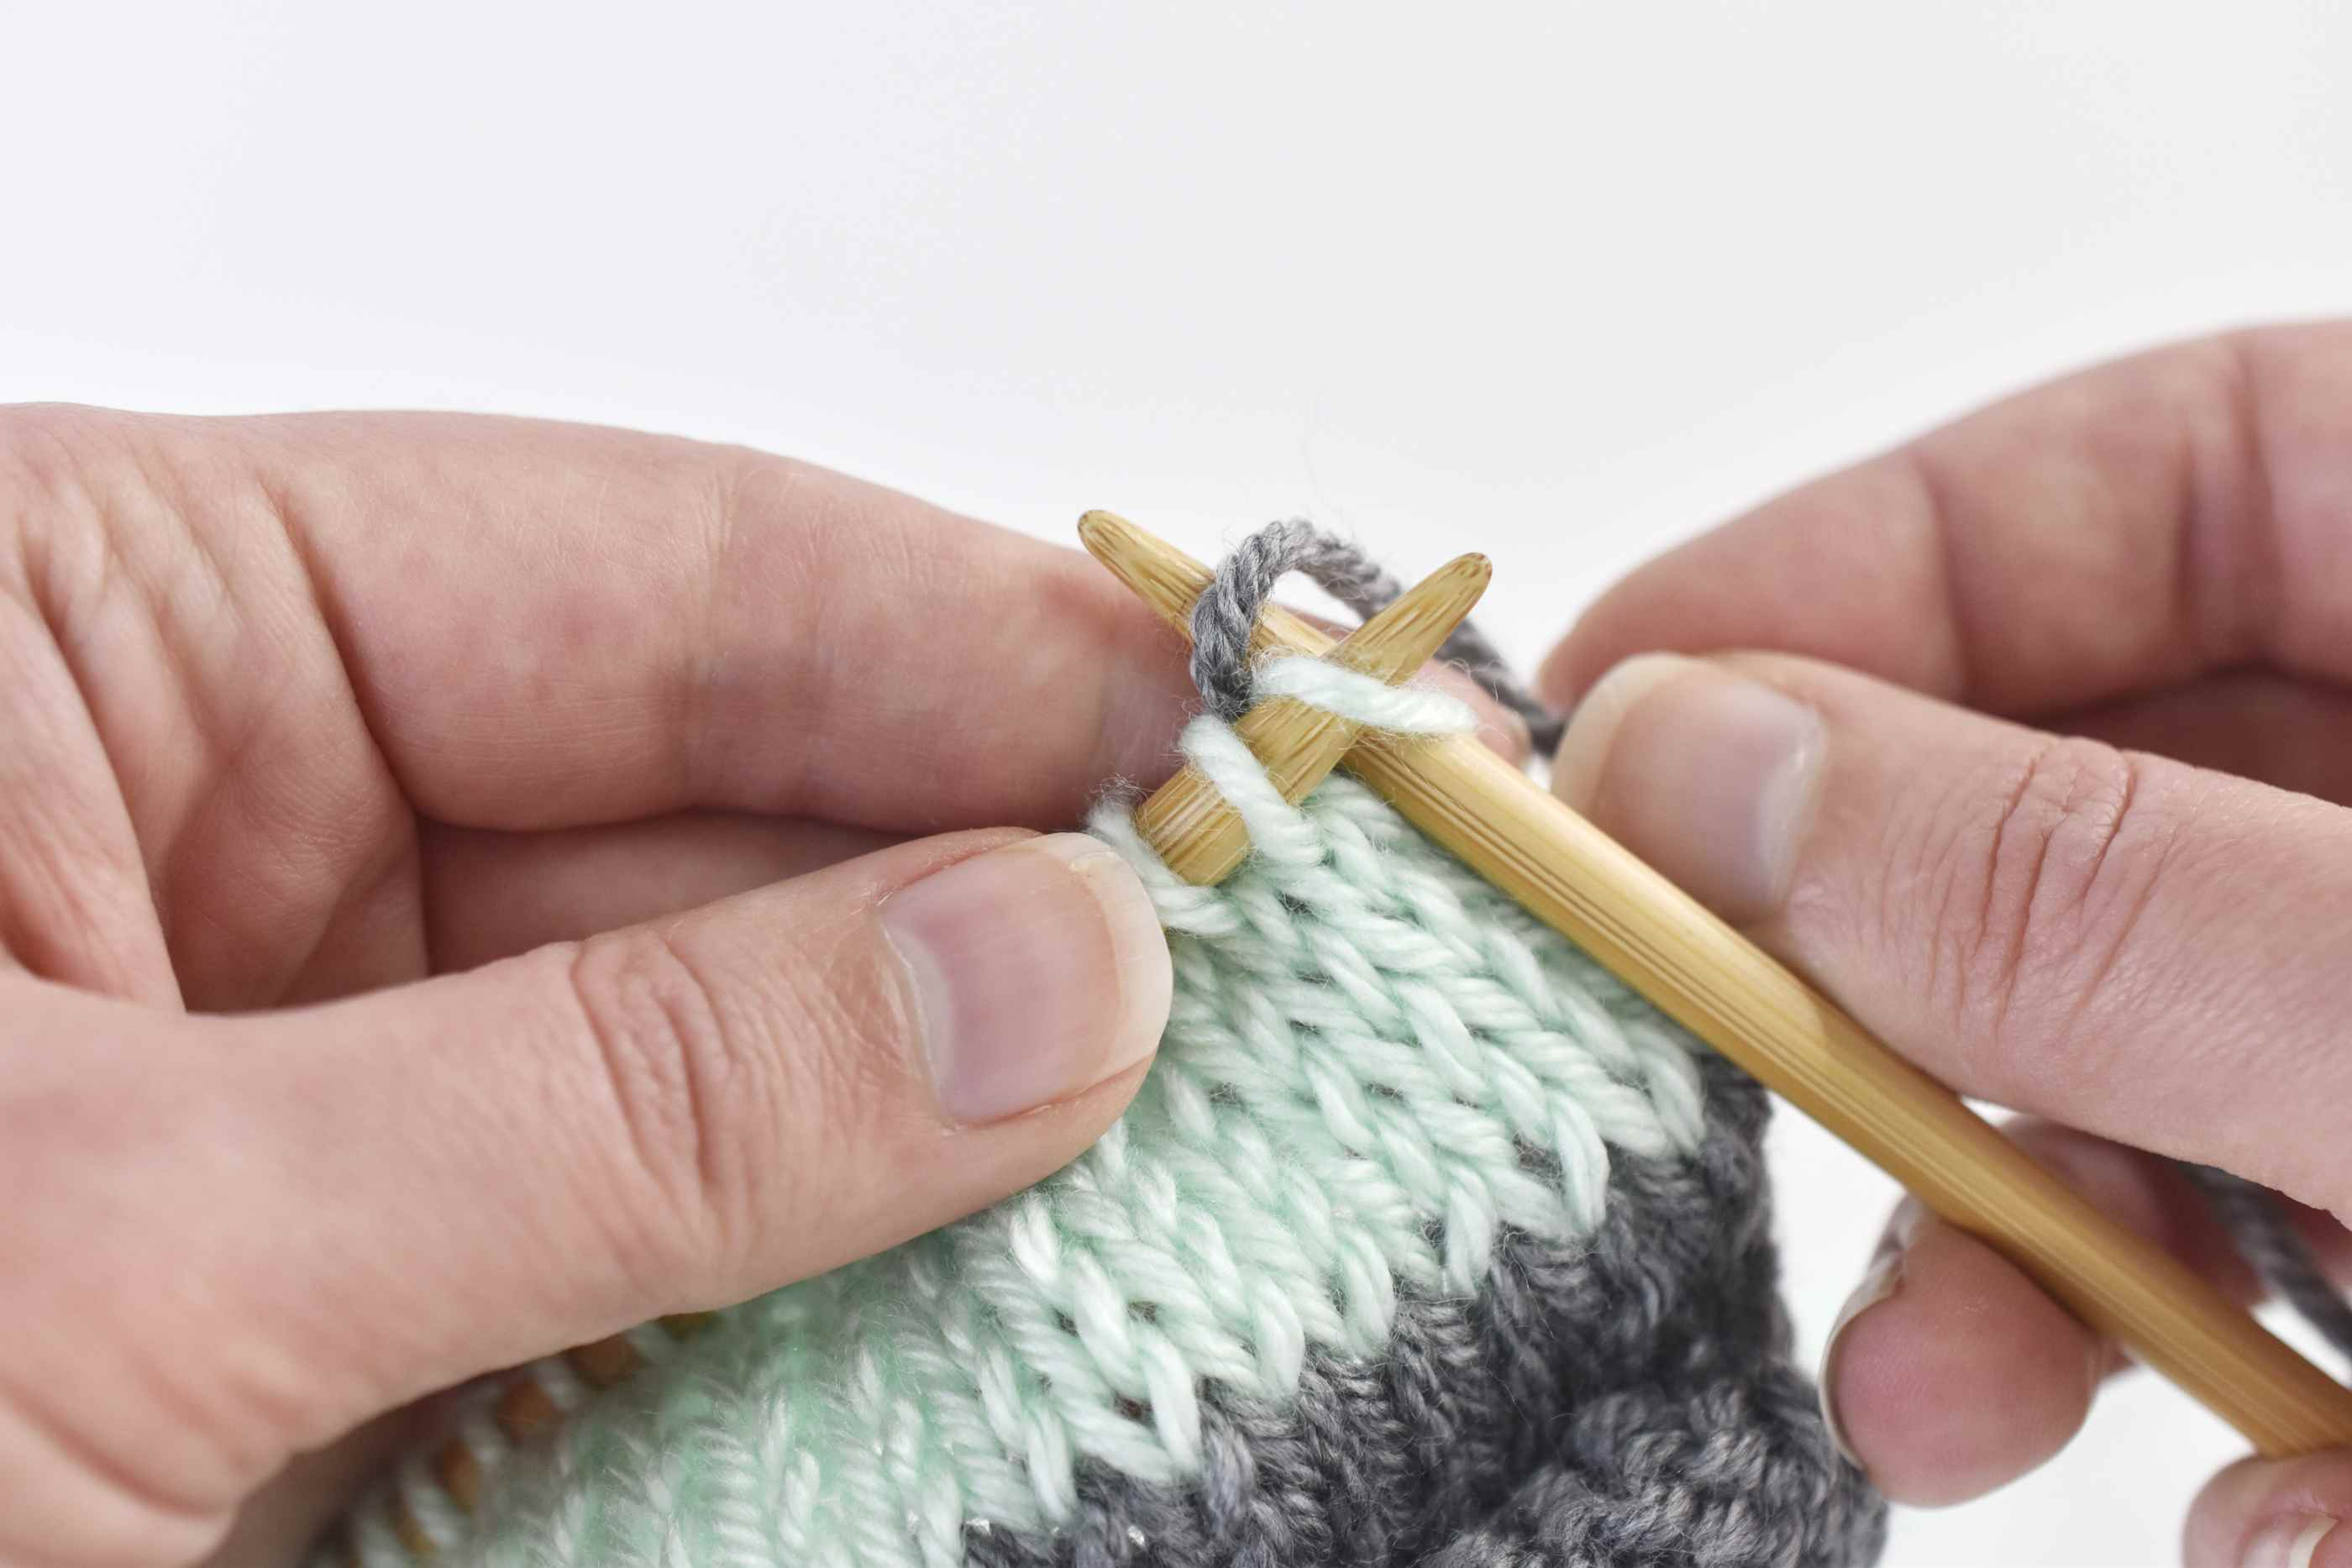 Change to the Carried Yarn